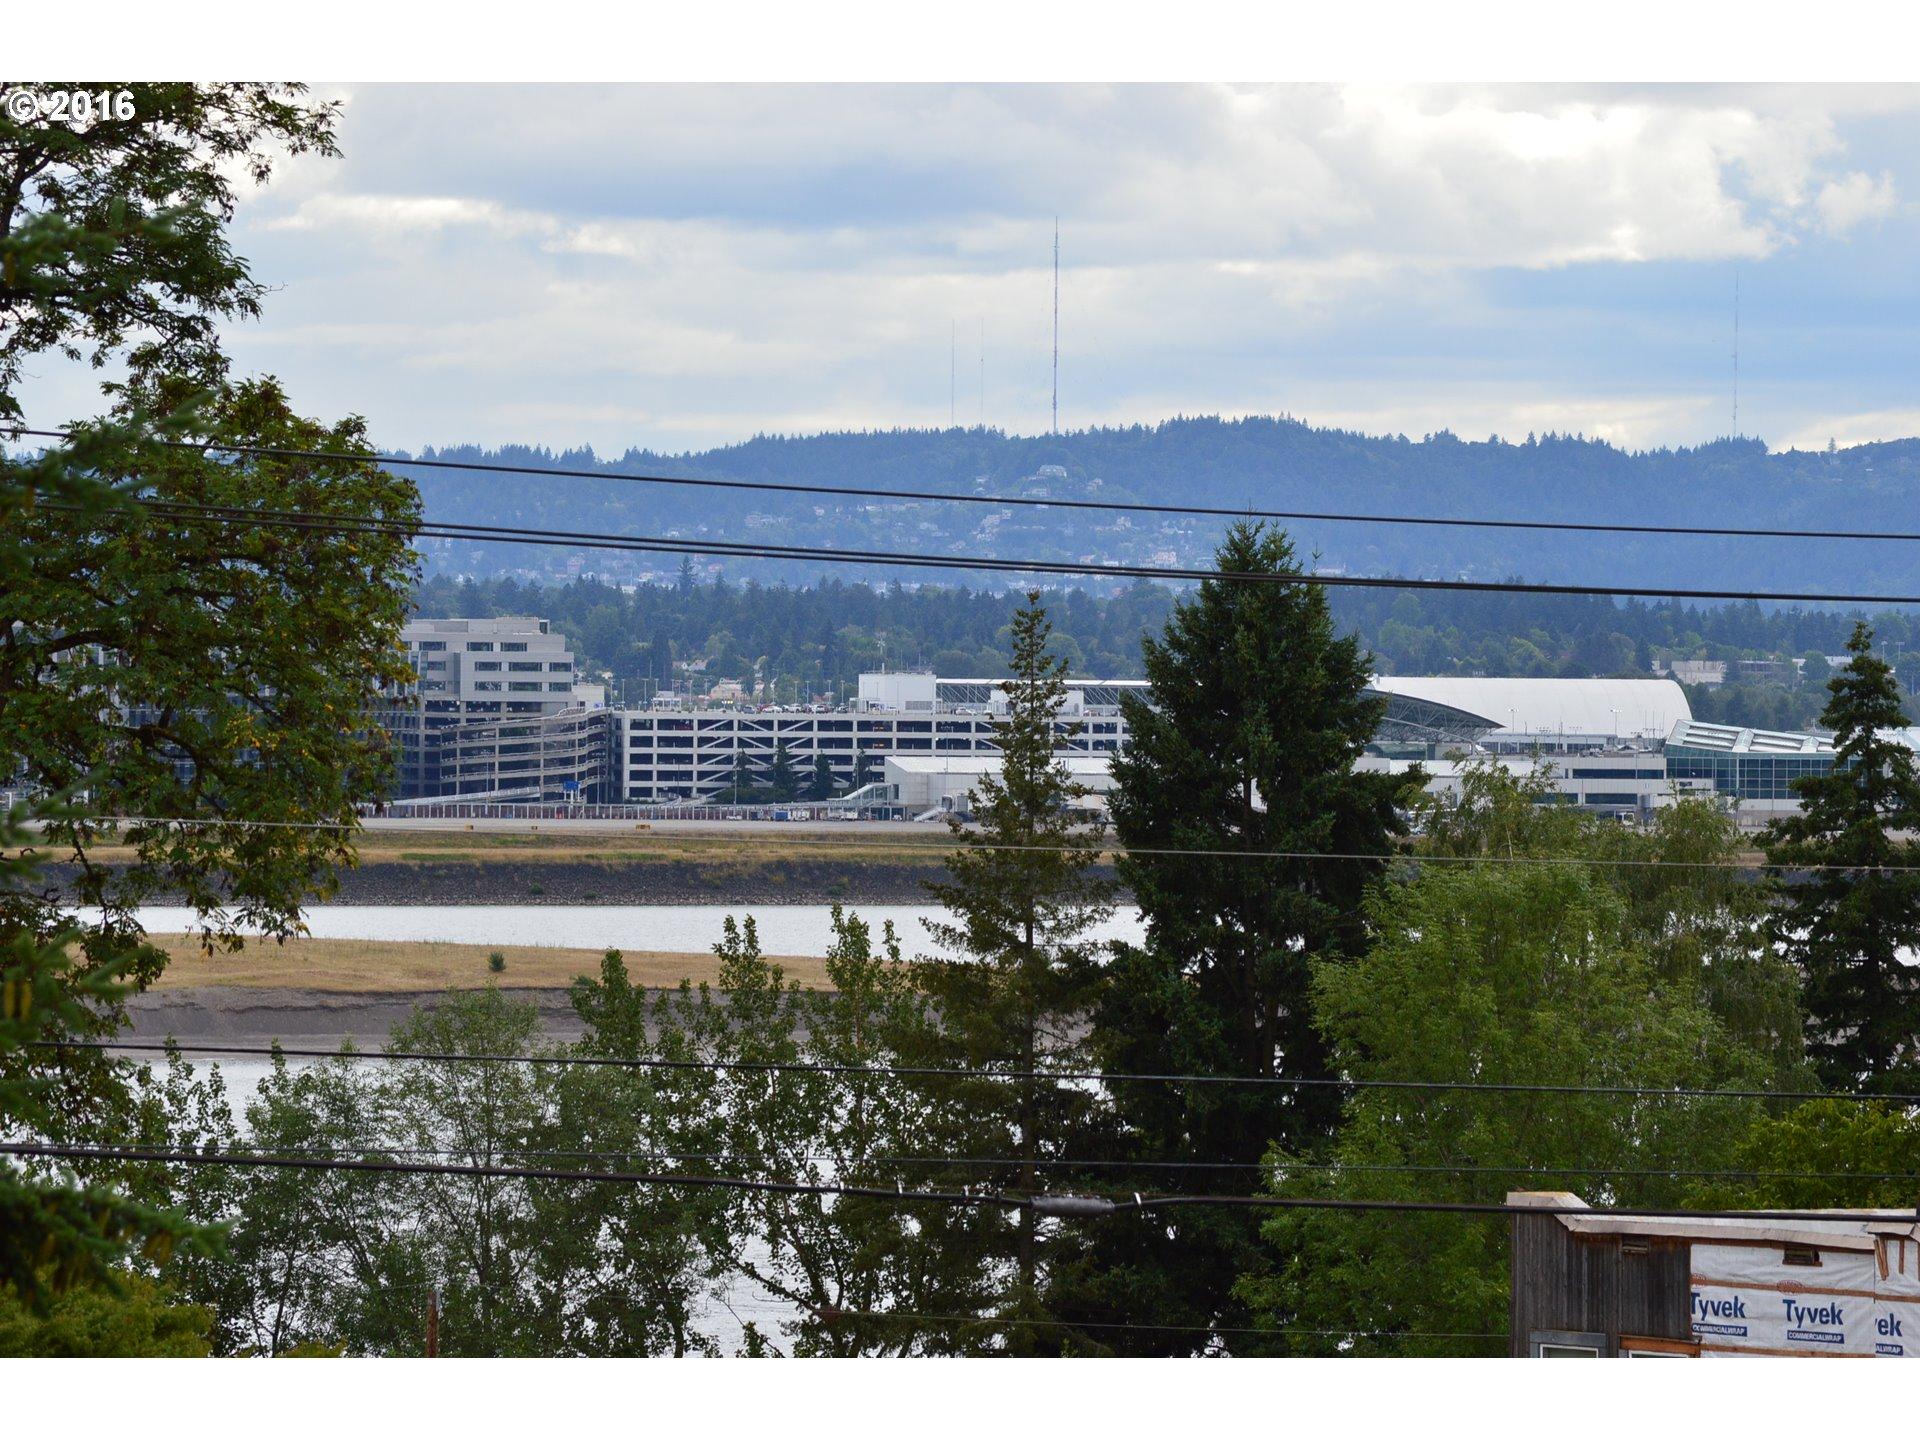 10706 Se Evergreen Hwy , Vancouver, WA - USA (photo 5)